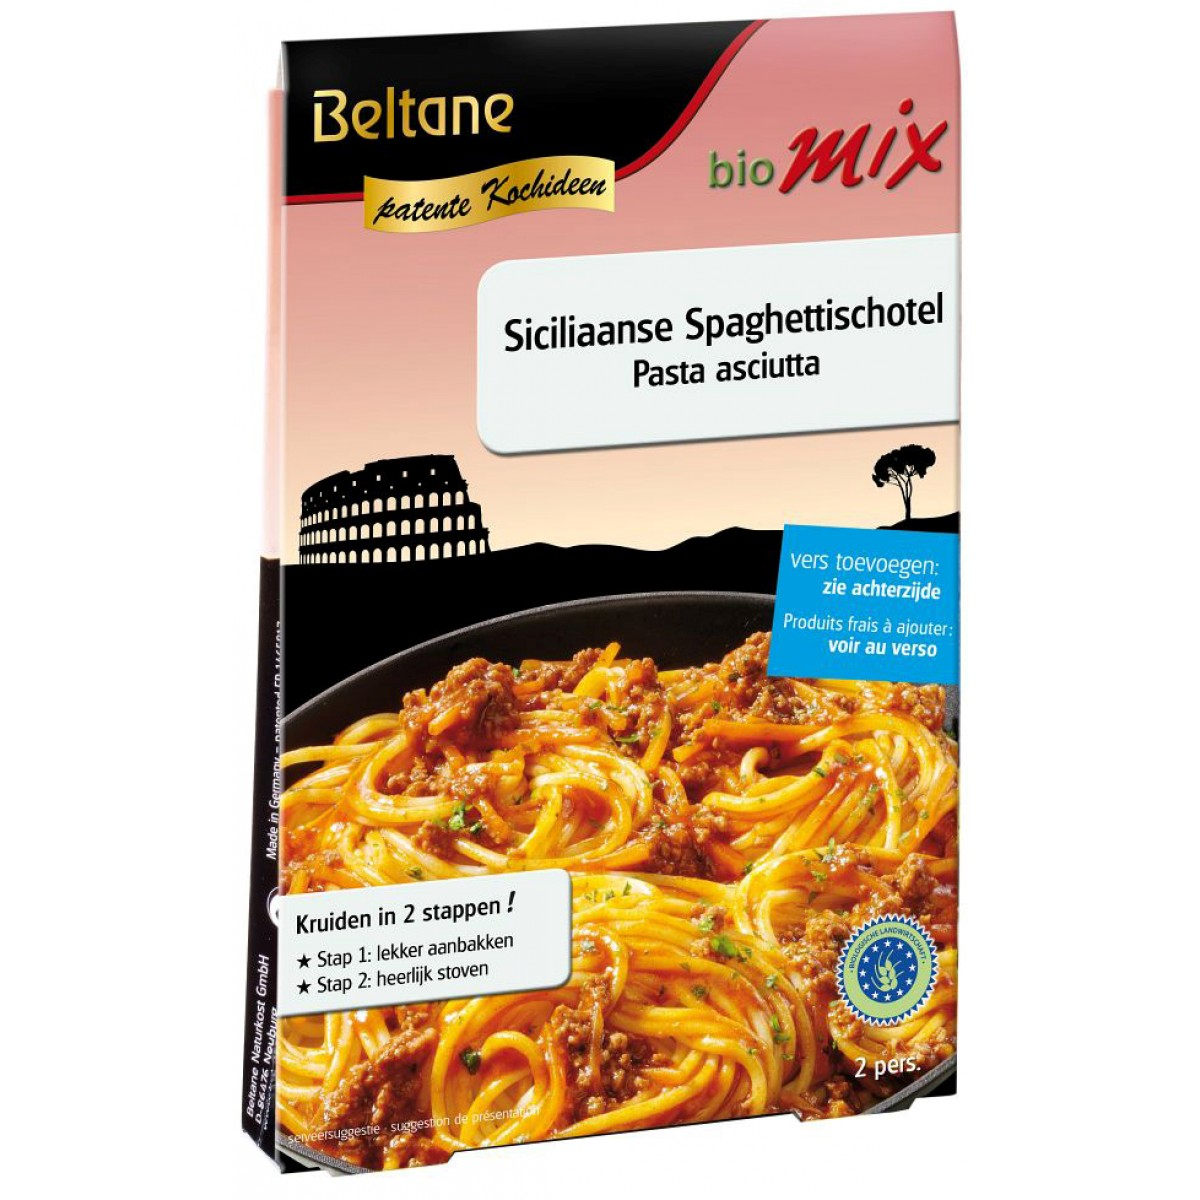 Siciliaanse Spaghettischotel